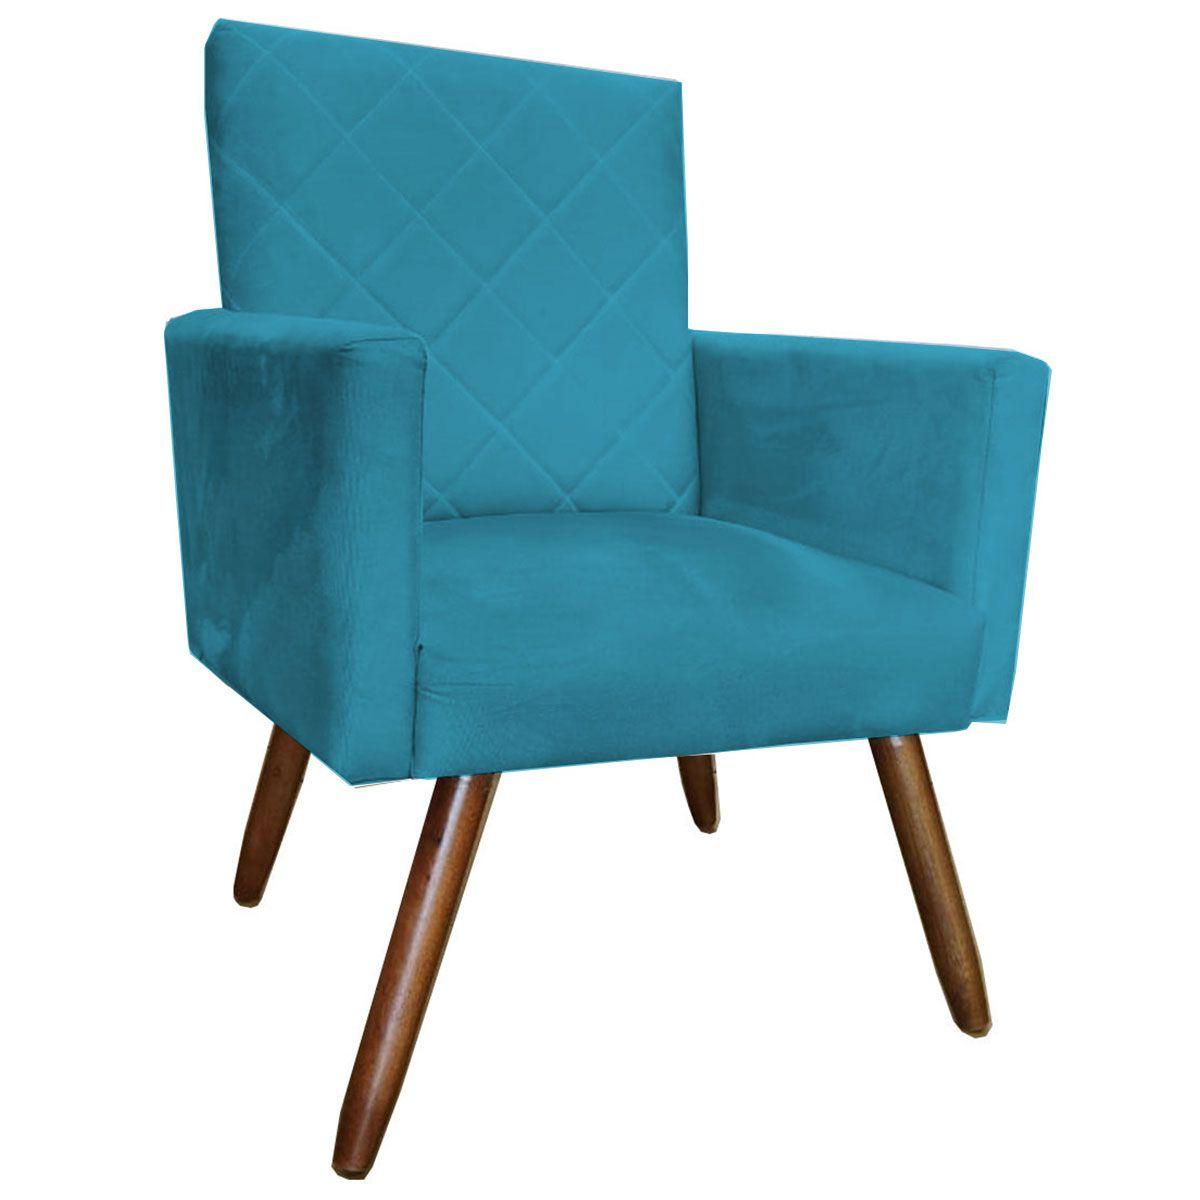 Poltrona Decorativa Beatriz Pé Palito Tecido Azul Turquesa